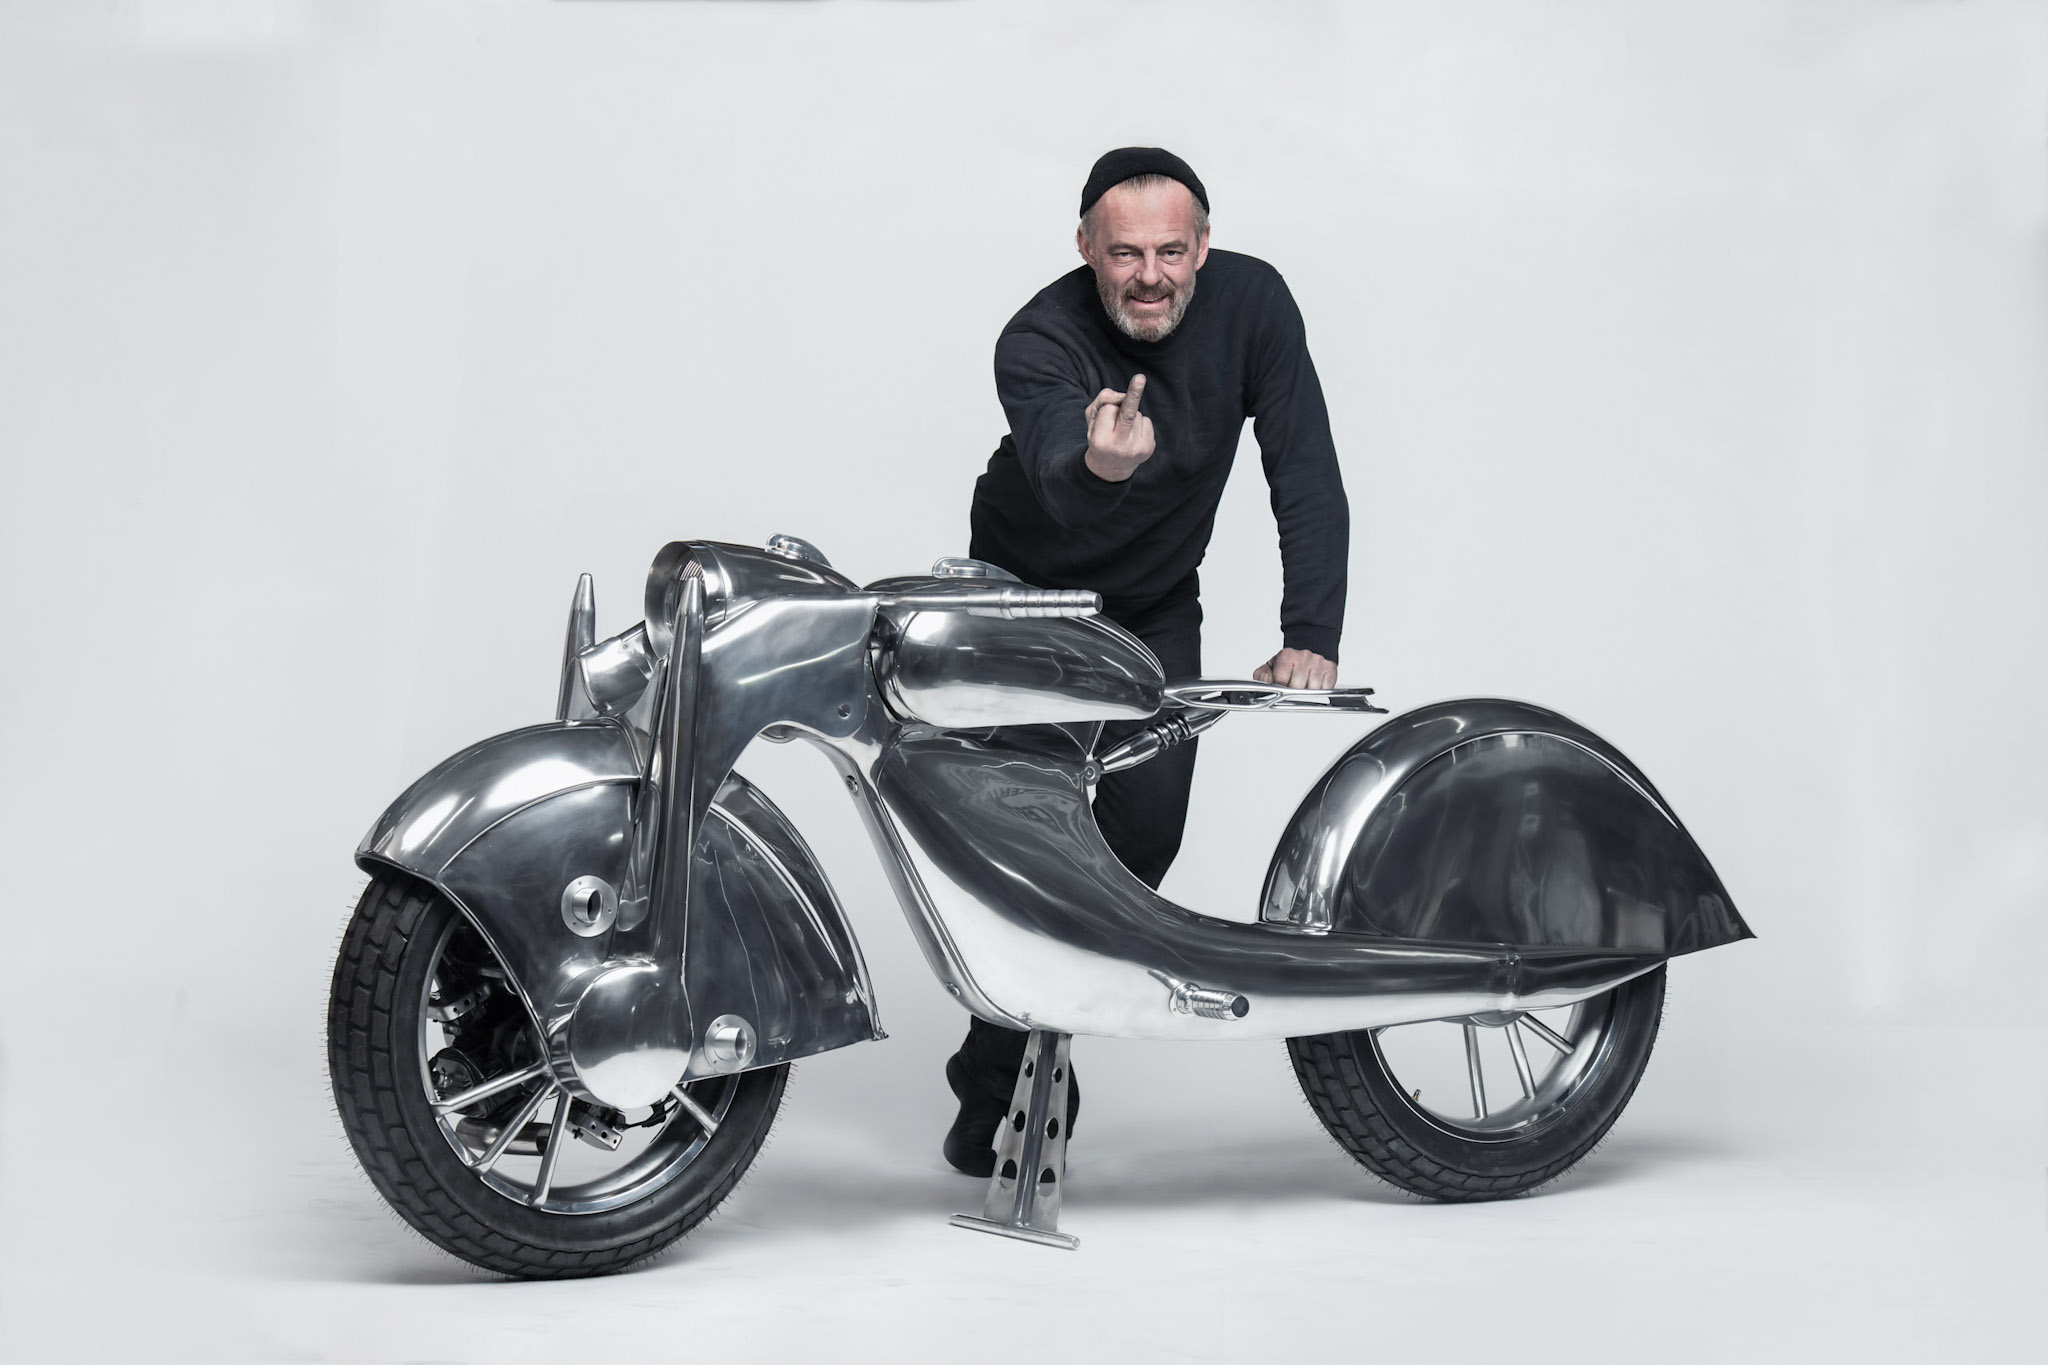 Craig Rodsmith and his engine-wheeled custom bike 'The Killer'.